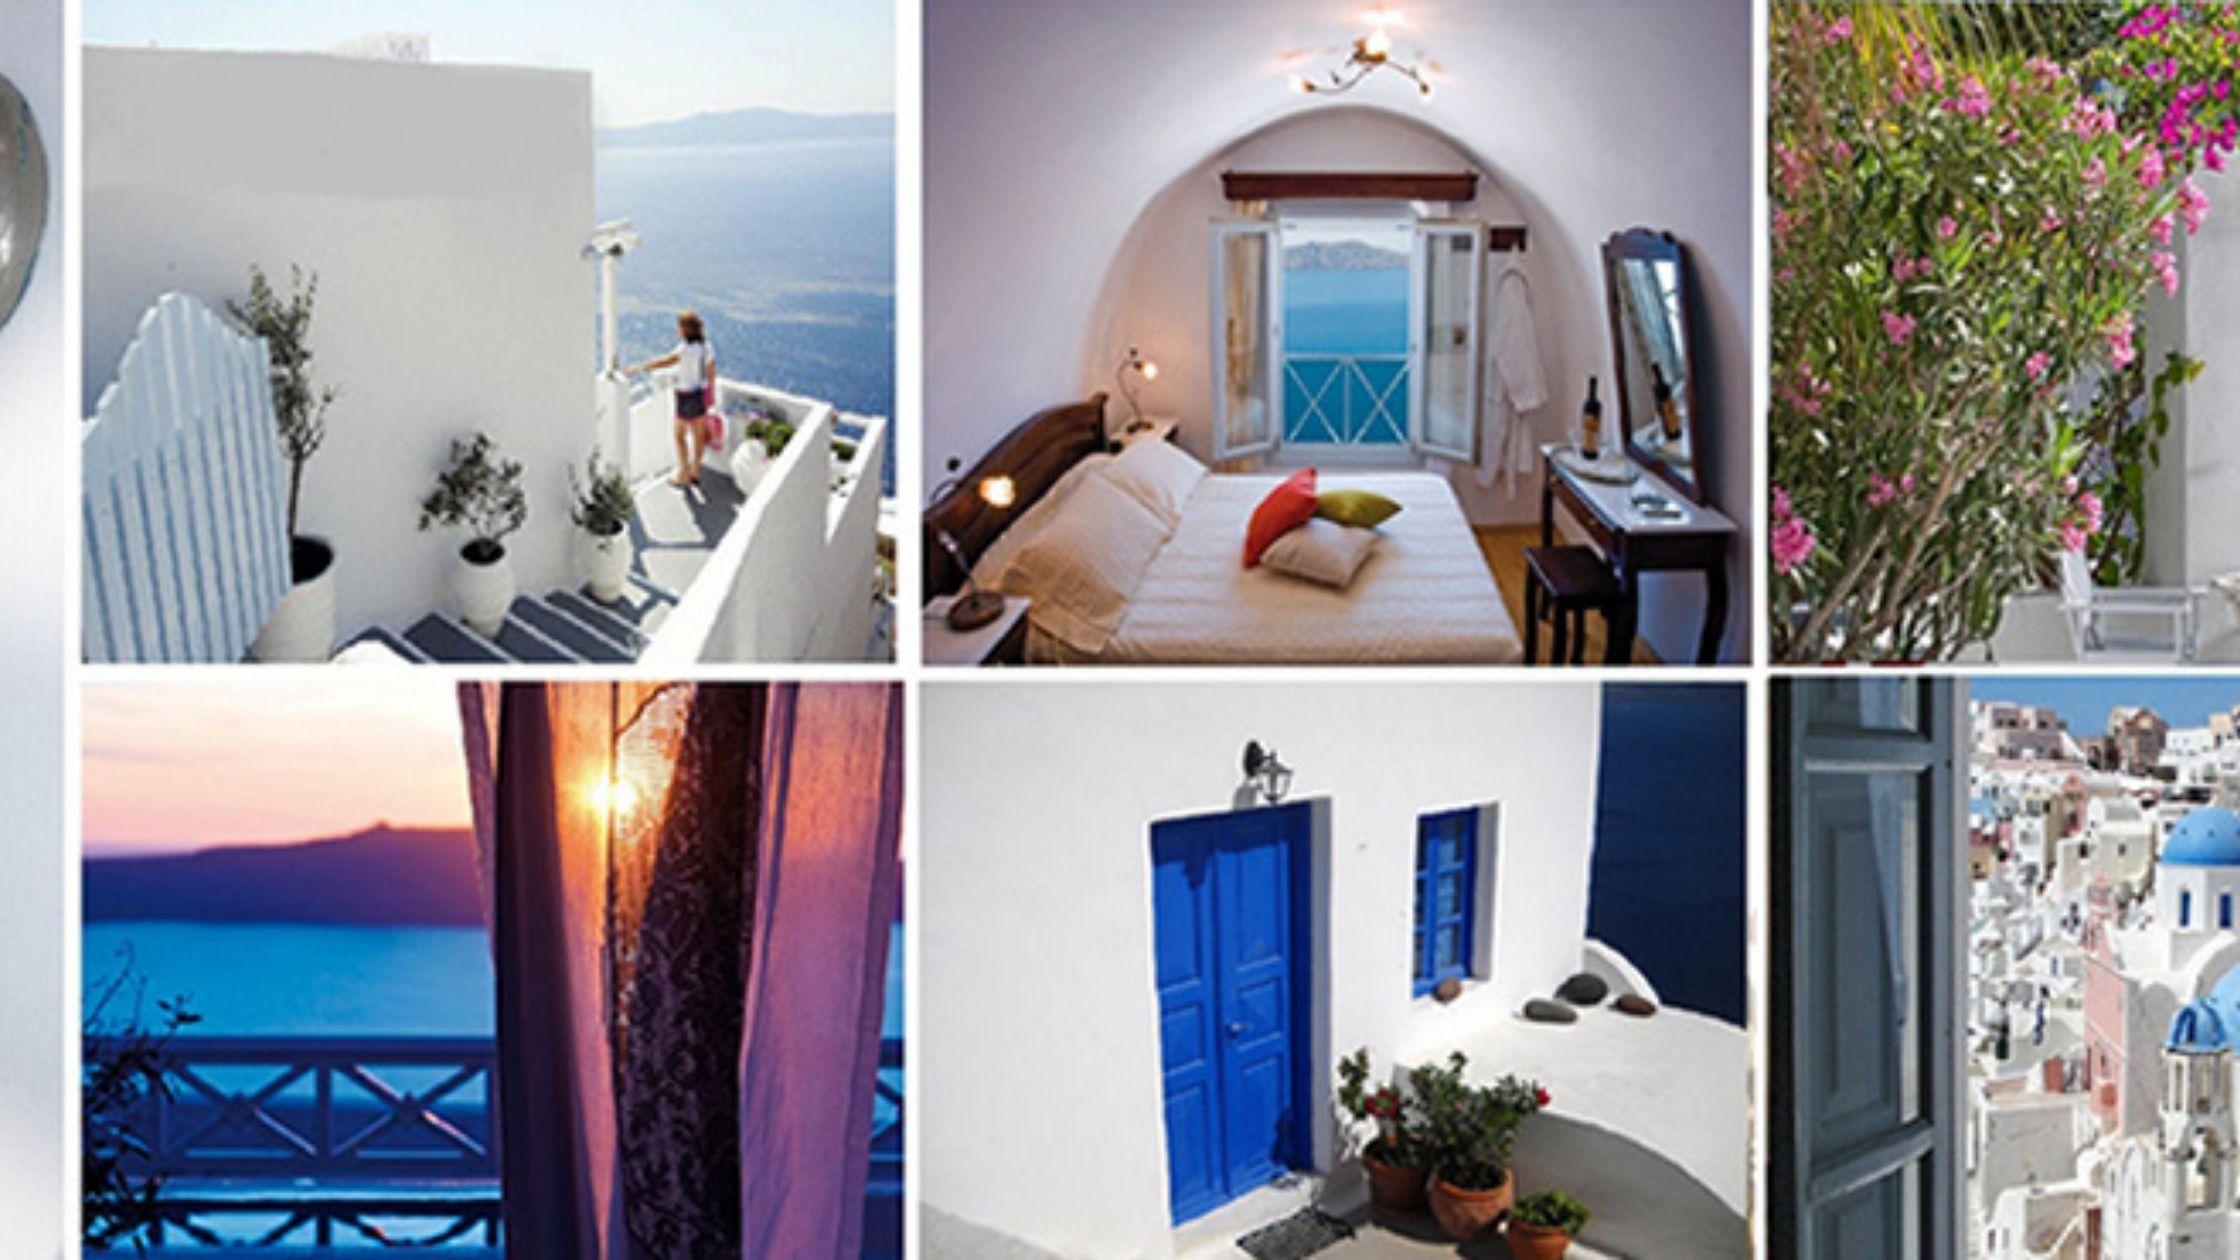 santorini hotel collage